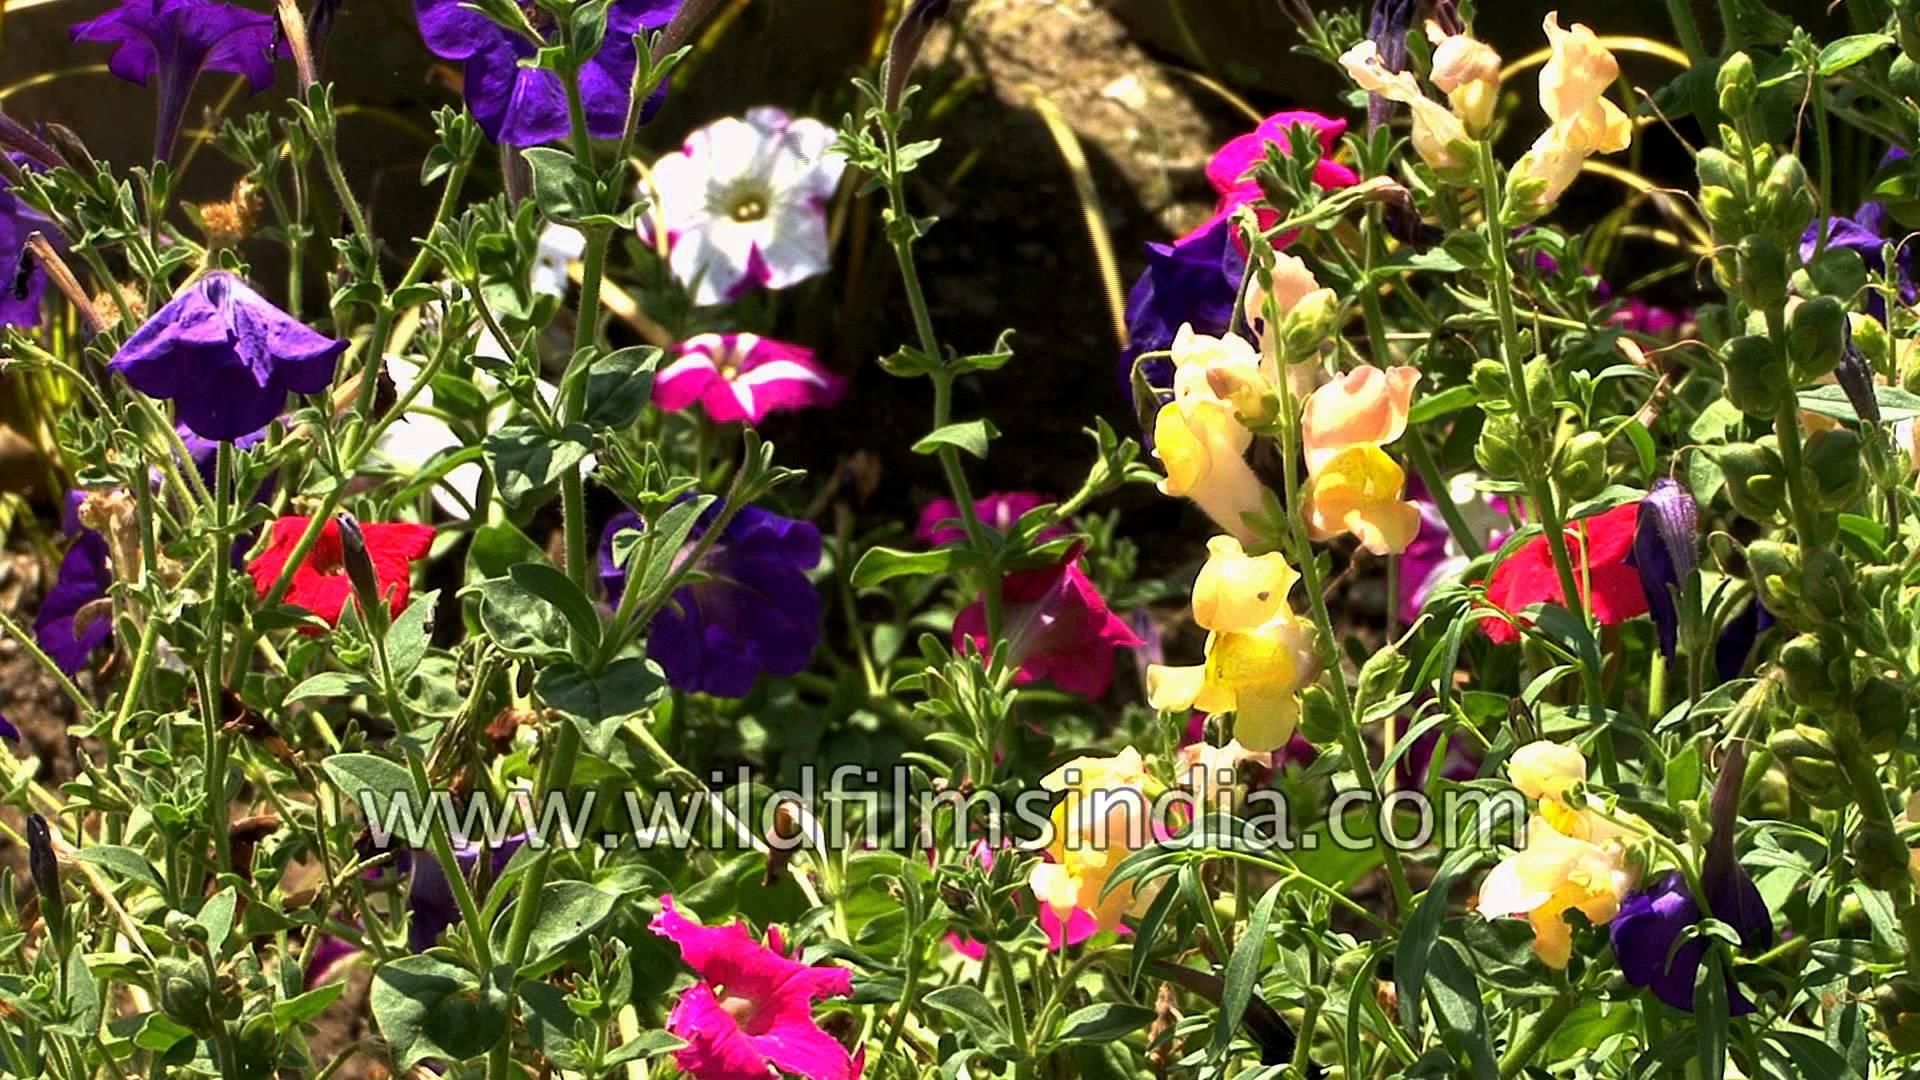 Garden Flowers: Godetia, Aster, Phlox, Petunia, Verbena, Francesia.